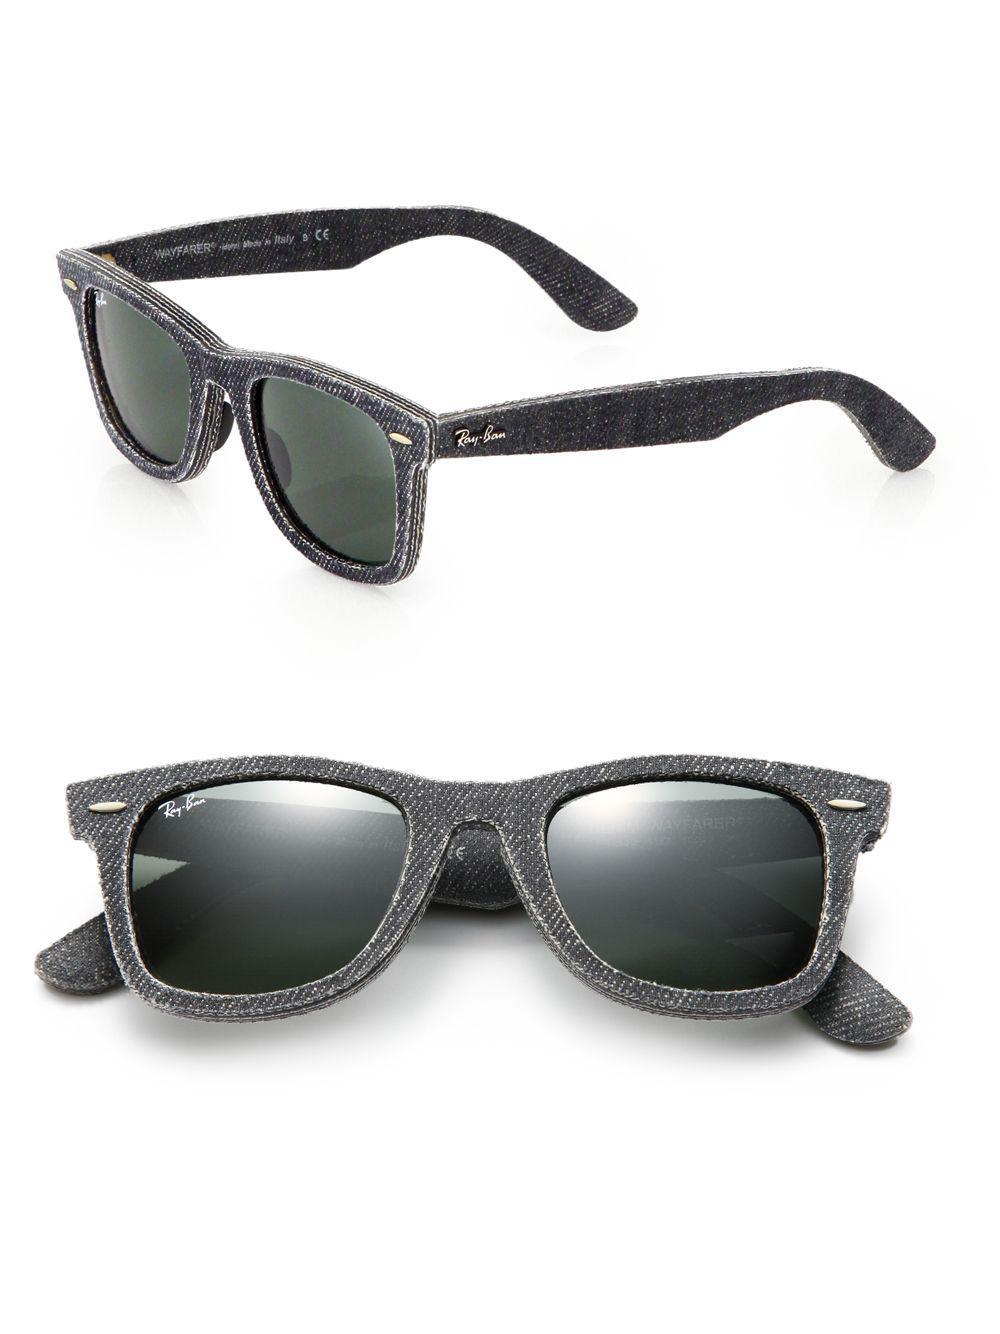 22c20d59084 Ray-Ban 50mm Denim Wayfarer Sunglasses in Black - Save ...